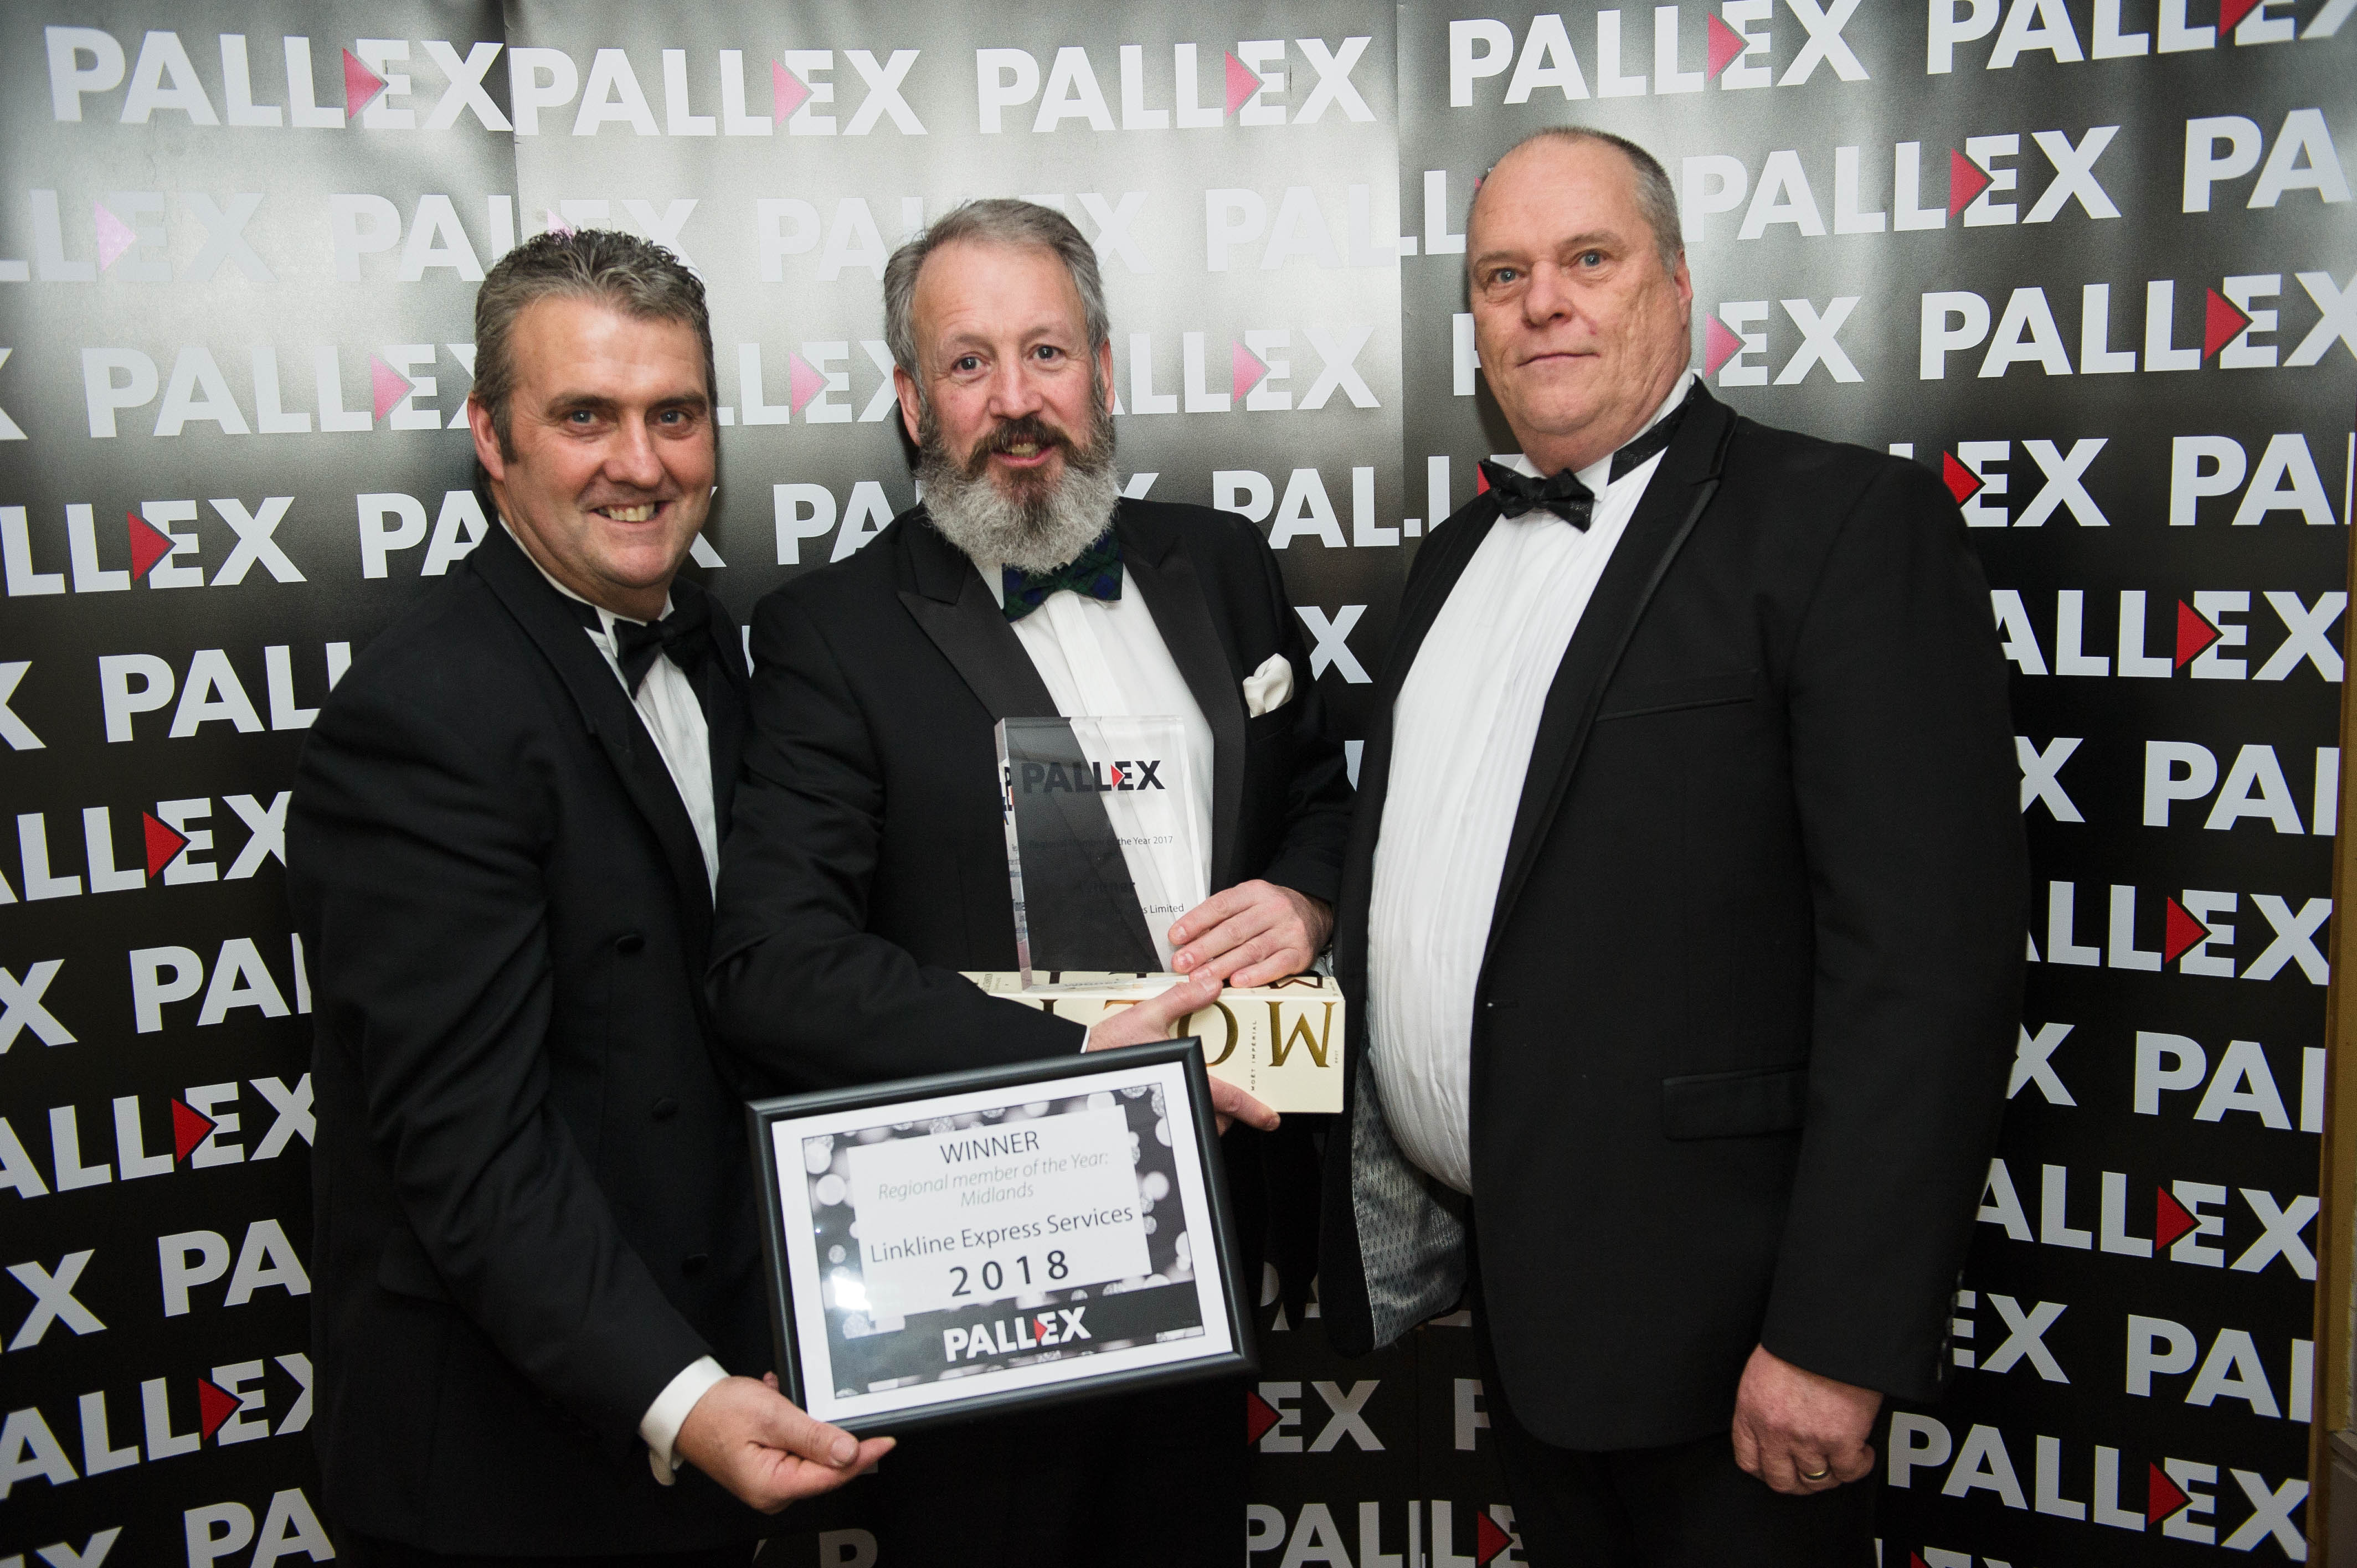 Pallex conference dinner dance